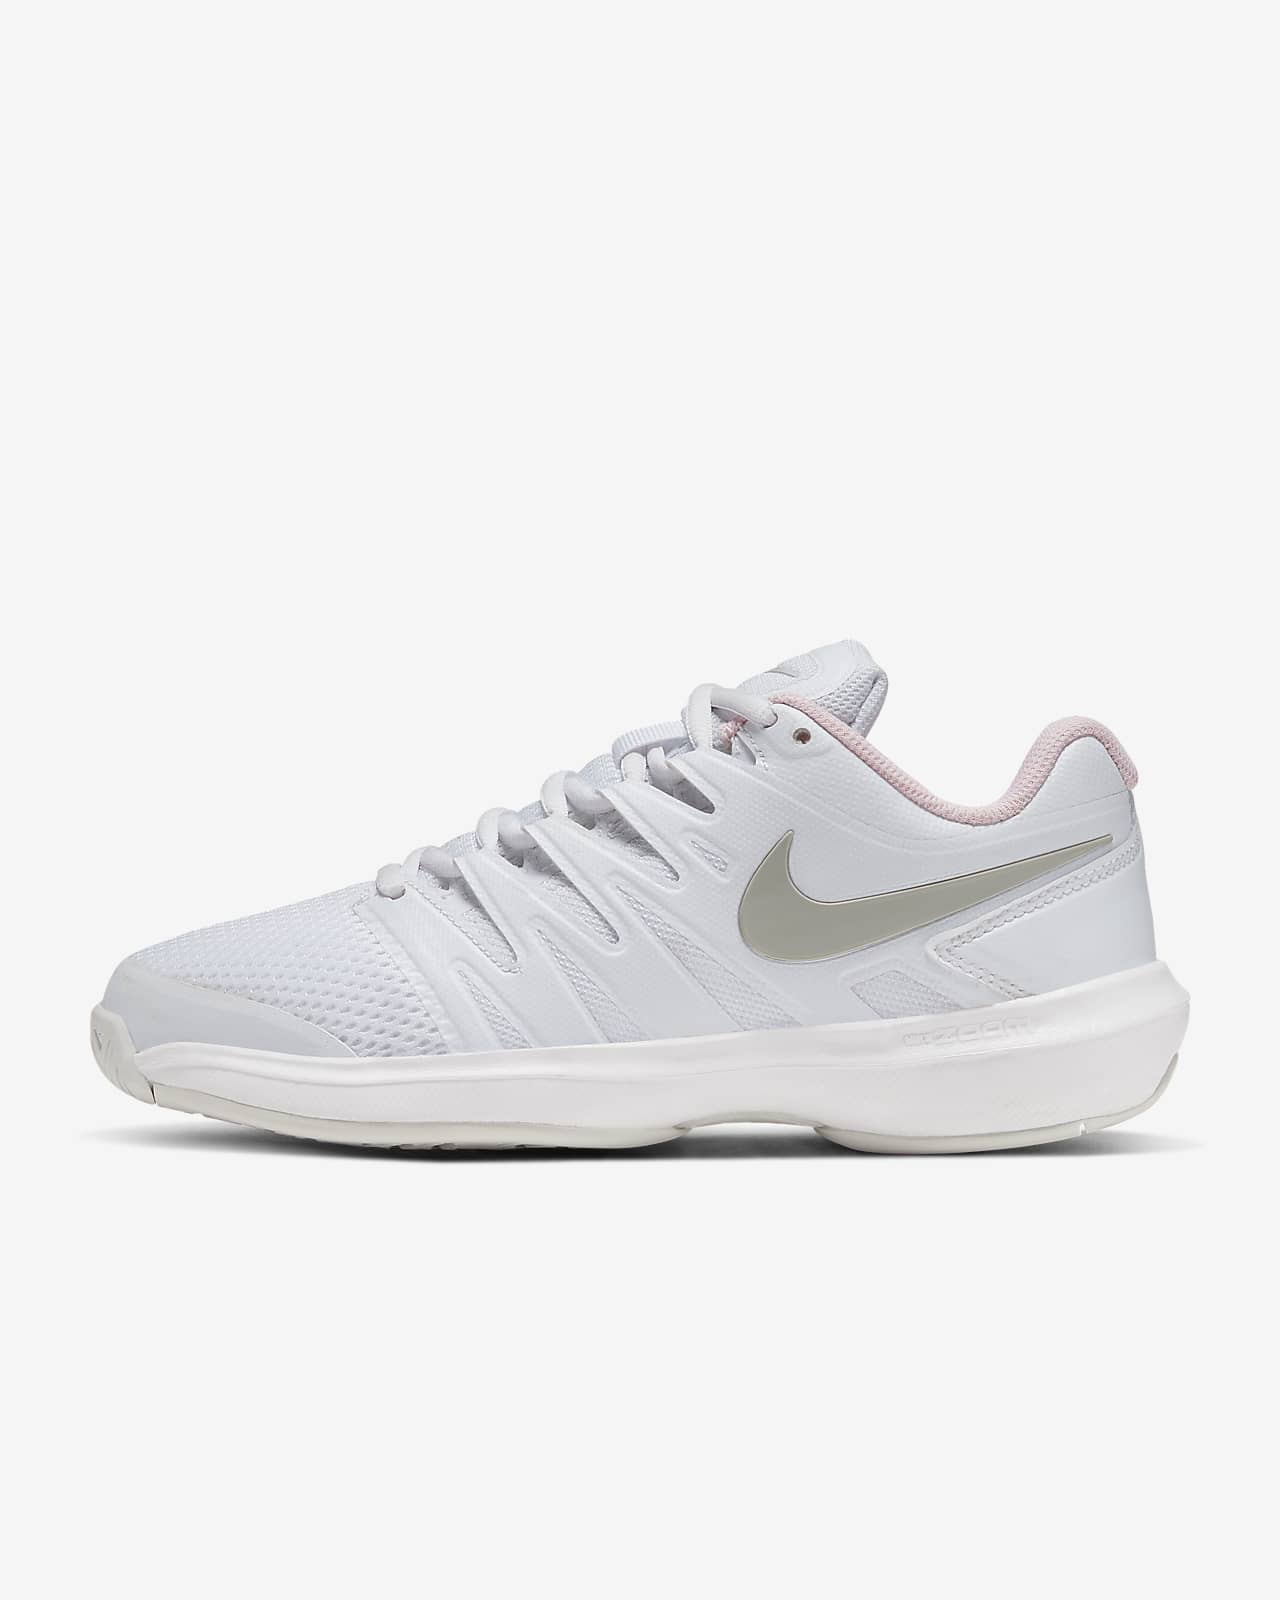 Calzado de tenis para mujer NikeCourt Air Zoom Prestige